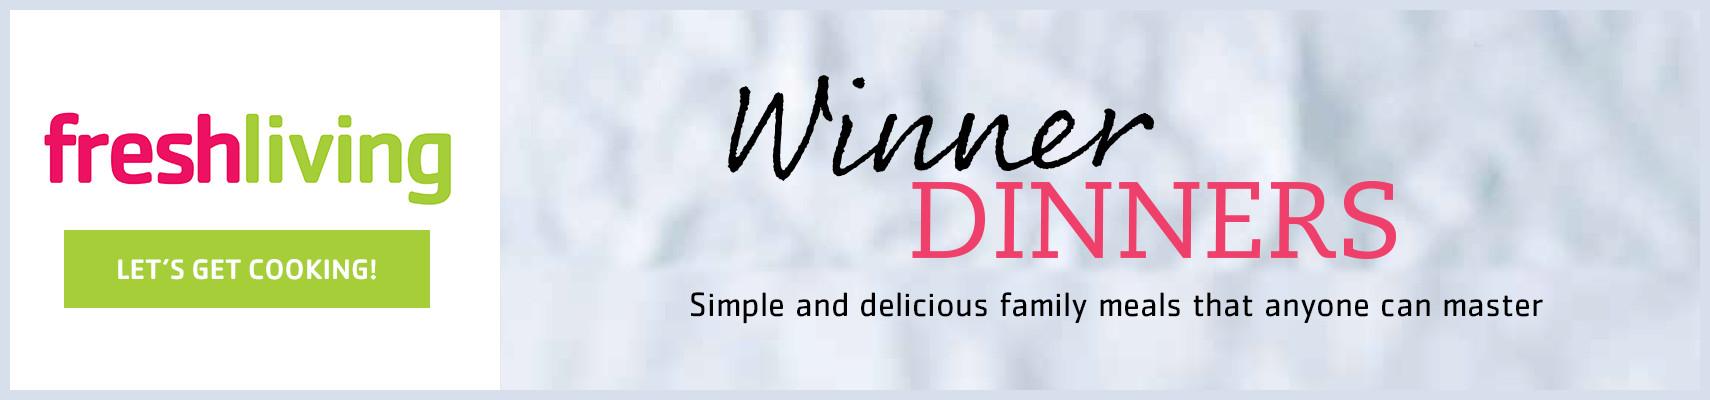 Winner dinners (1).jpg